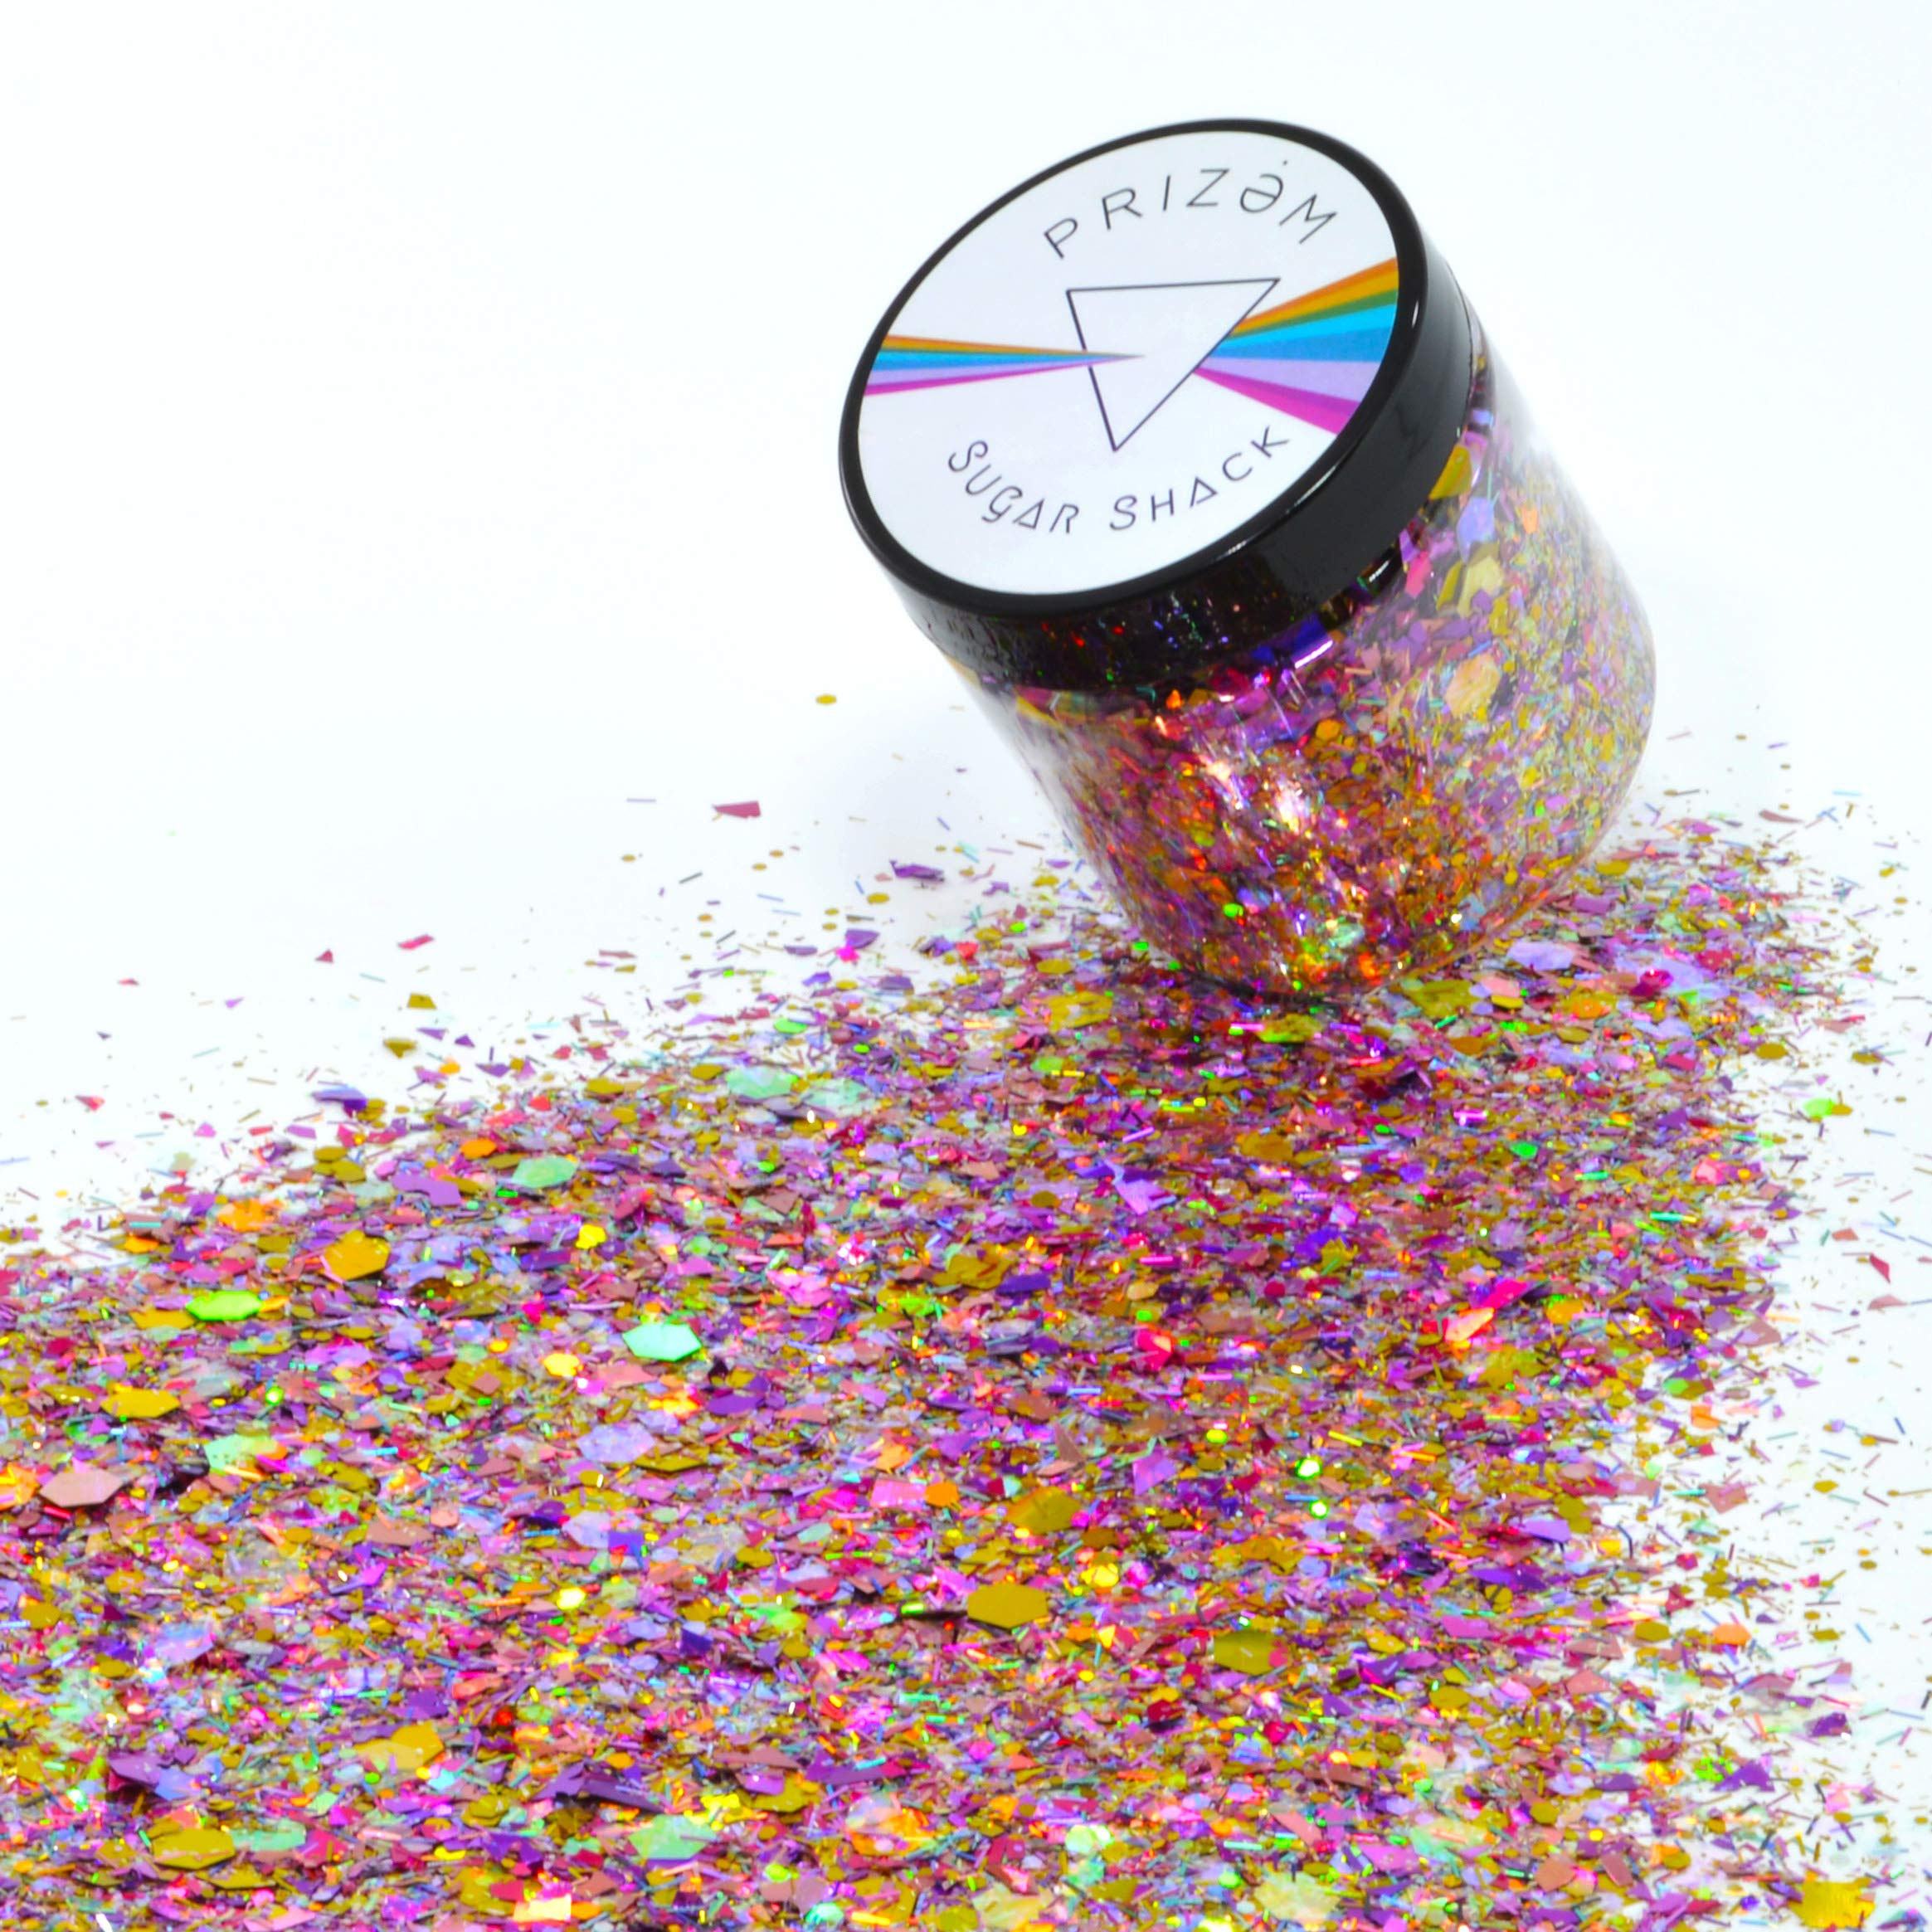 Sugar Shack Glitter ▽ 60g ▽ Festival Glitter , Chunky Glitter , Makeup Glitter , Face Glitter , Body Glitter , Glitter Makeup , Hair Glitter , Cosmetic Glitter , Nail Glitter , Eyeshadow Glitter